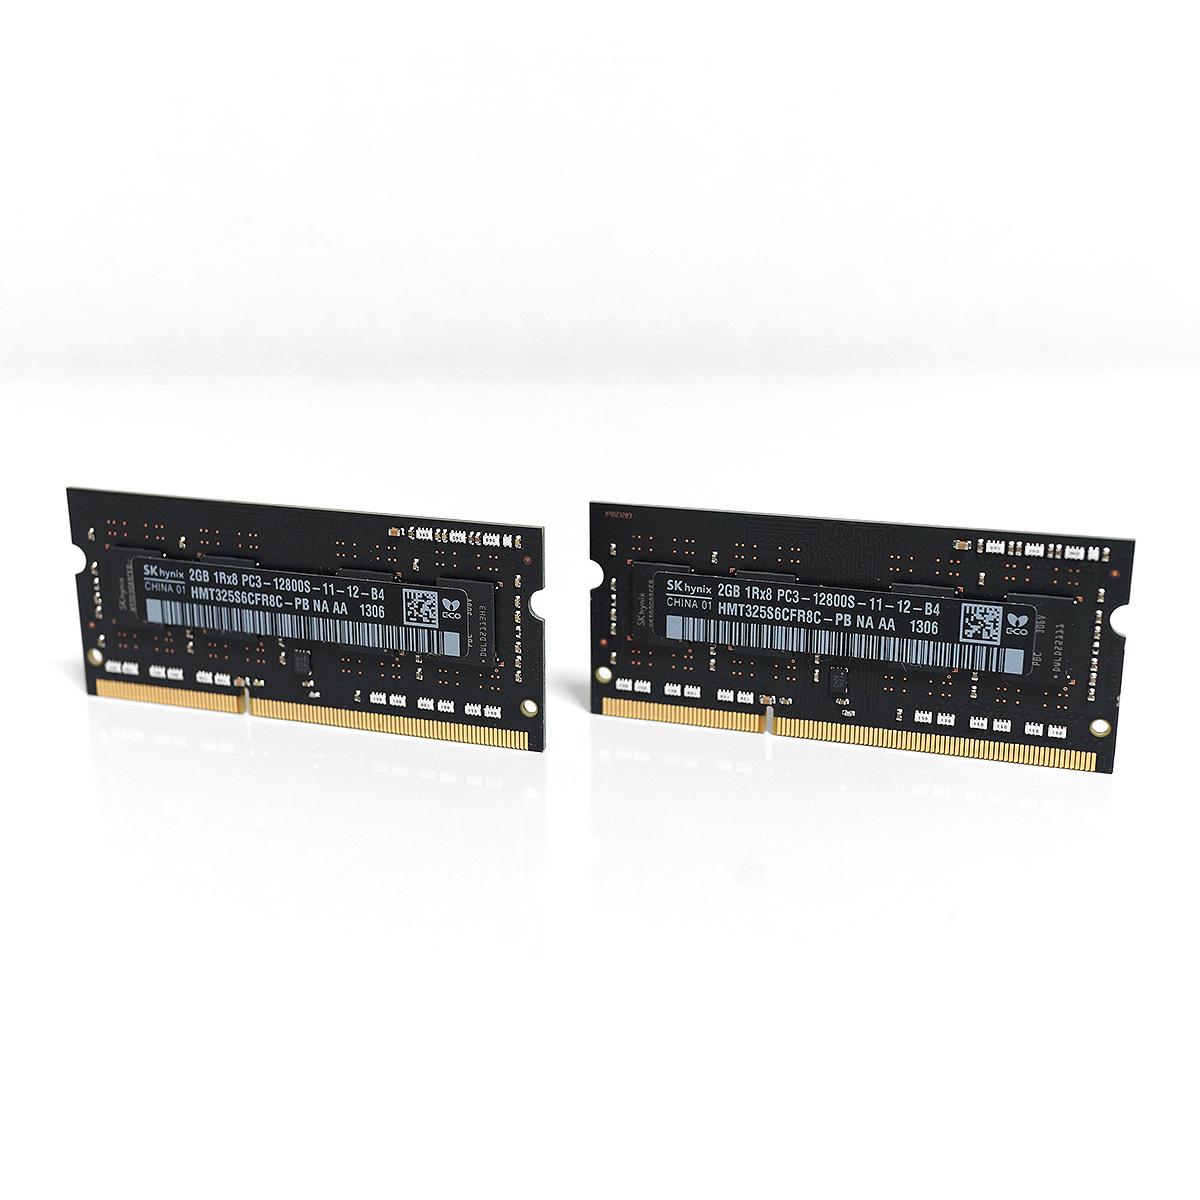 Apple純正 SK hynix PC3-12800S(DDR3-1600)4GB(2GB×2)